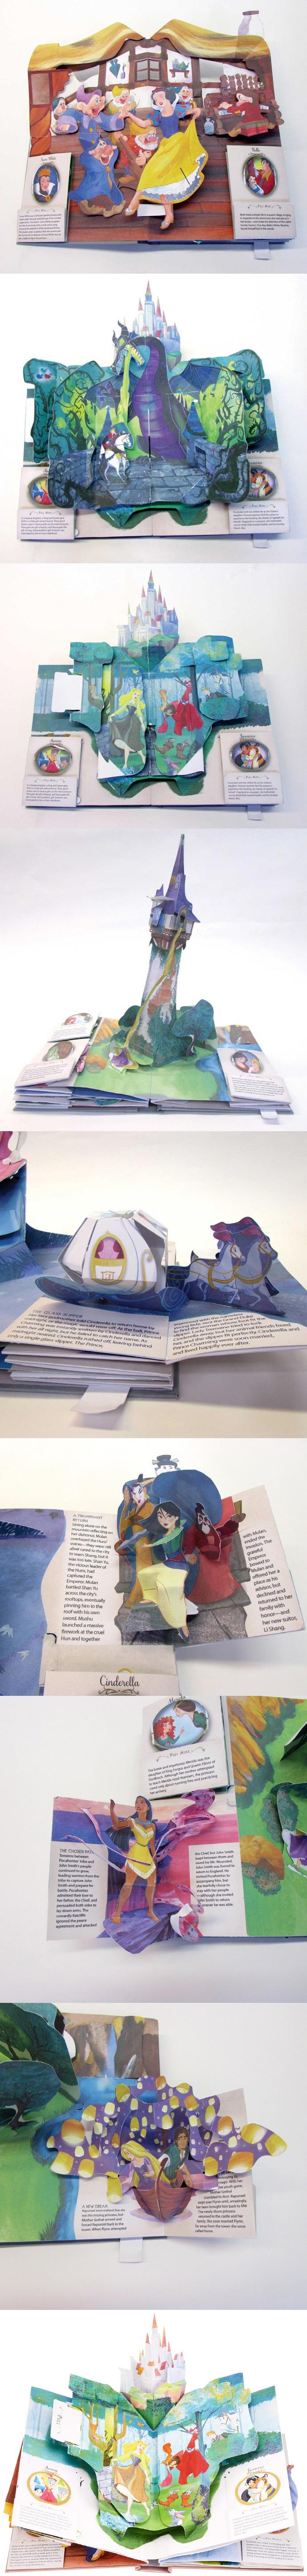 Disney Princess: A Magical Pop-Up World 도서 상세이미지